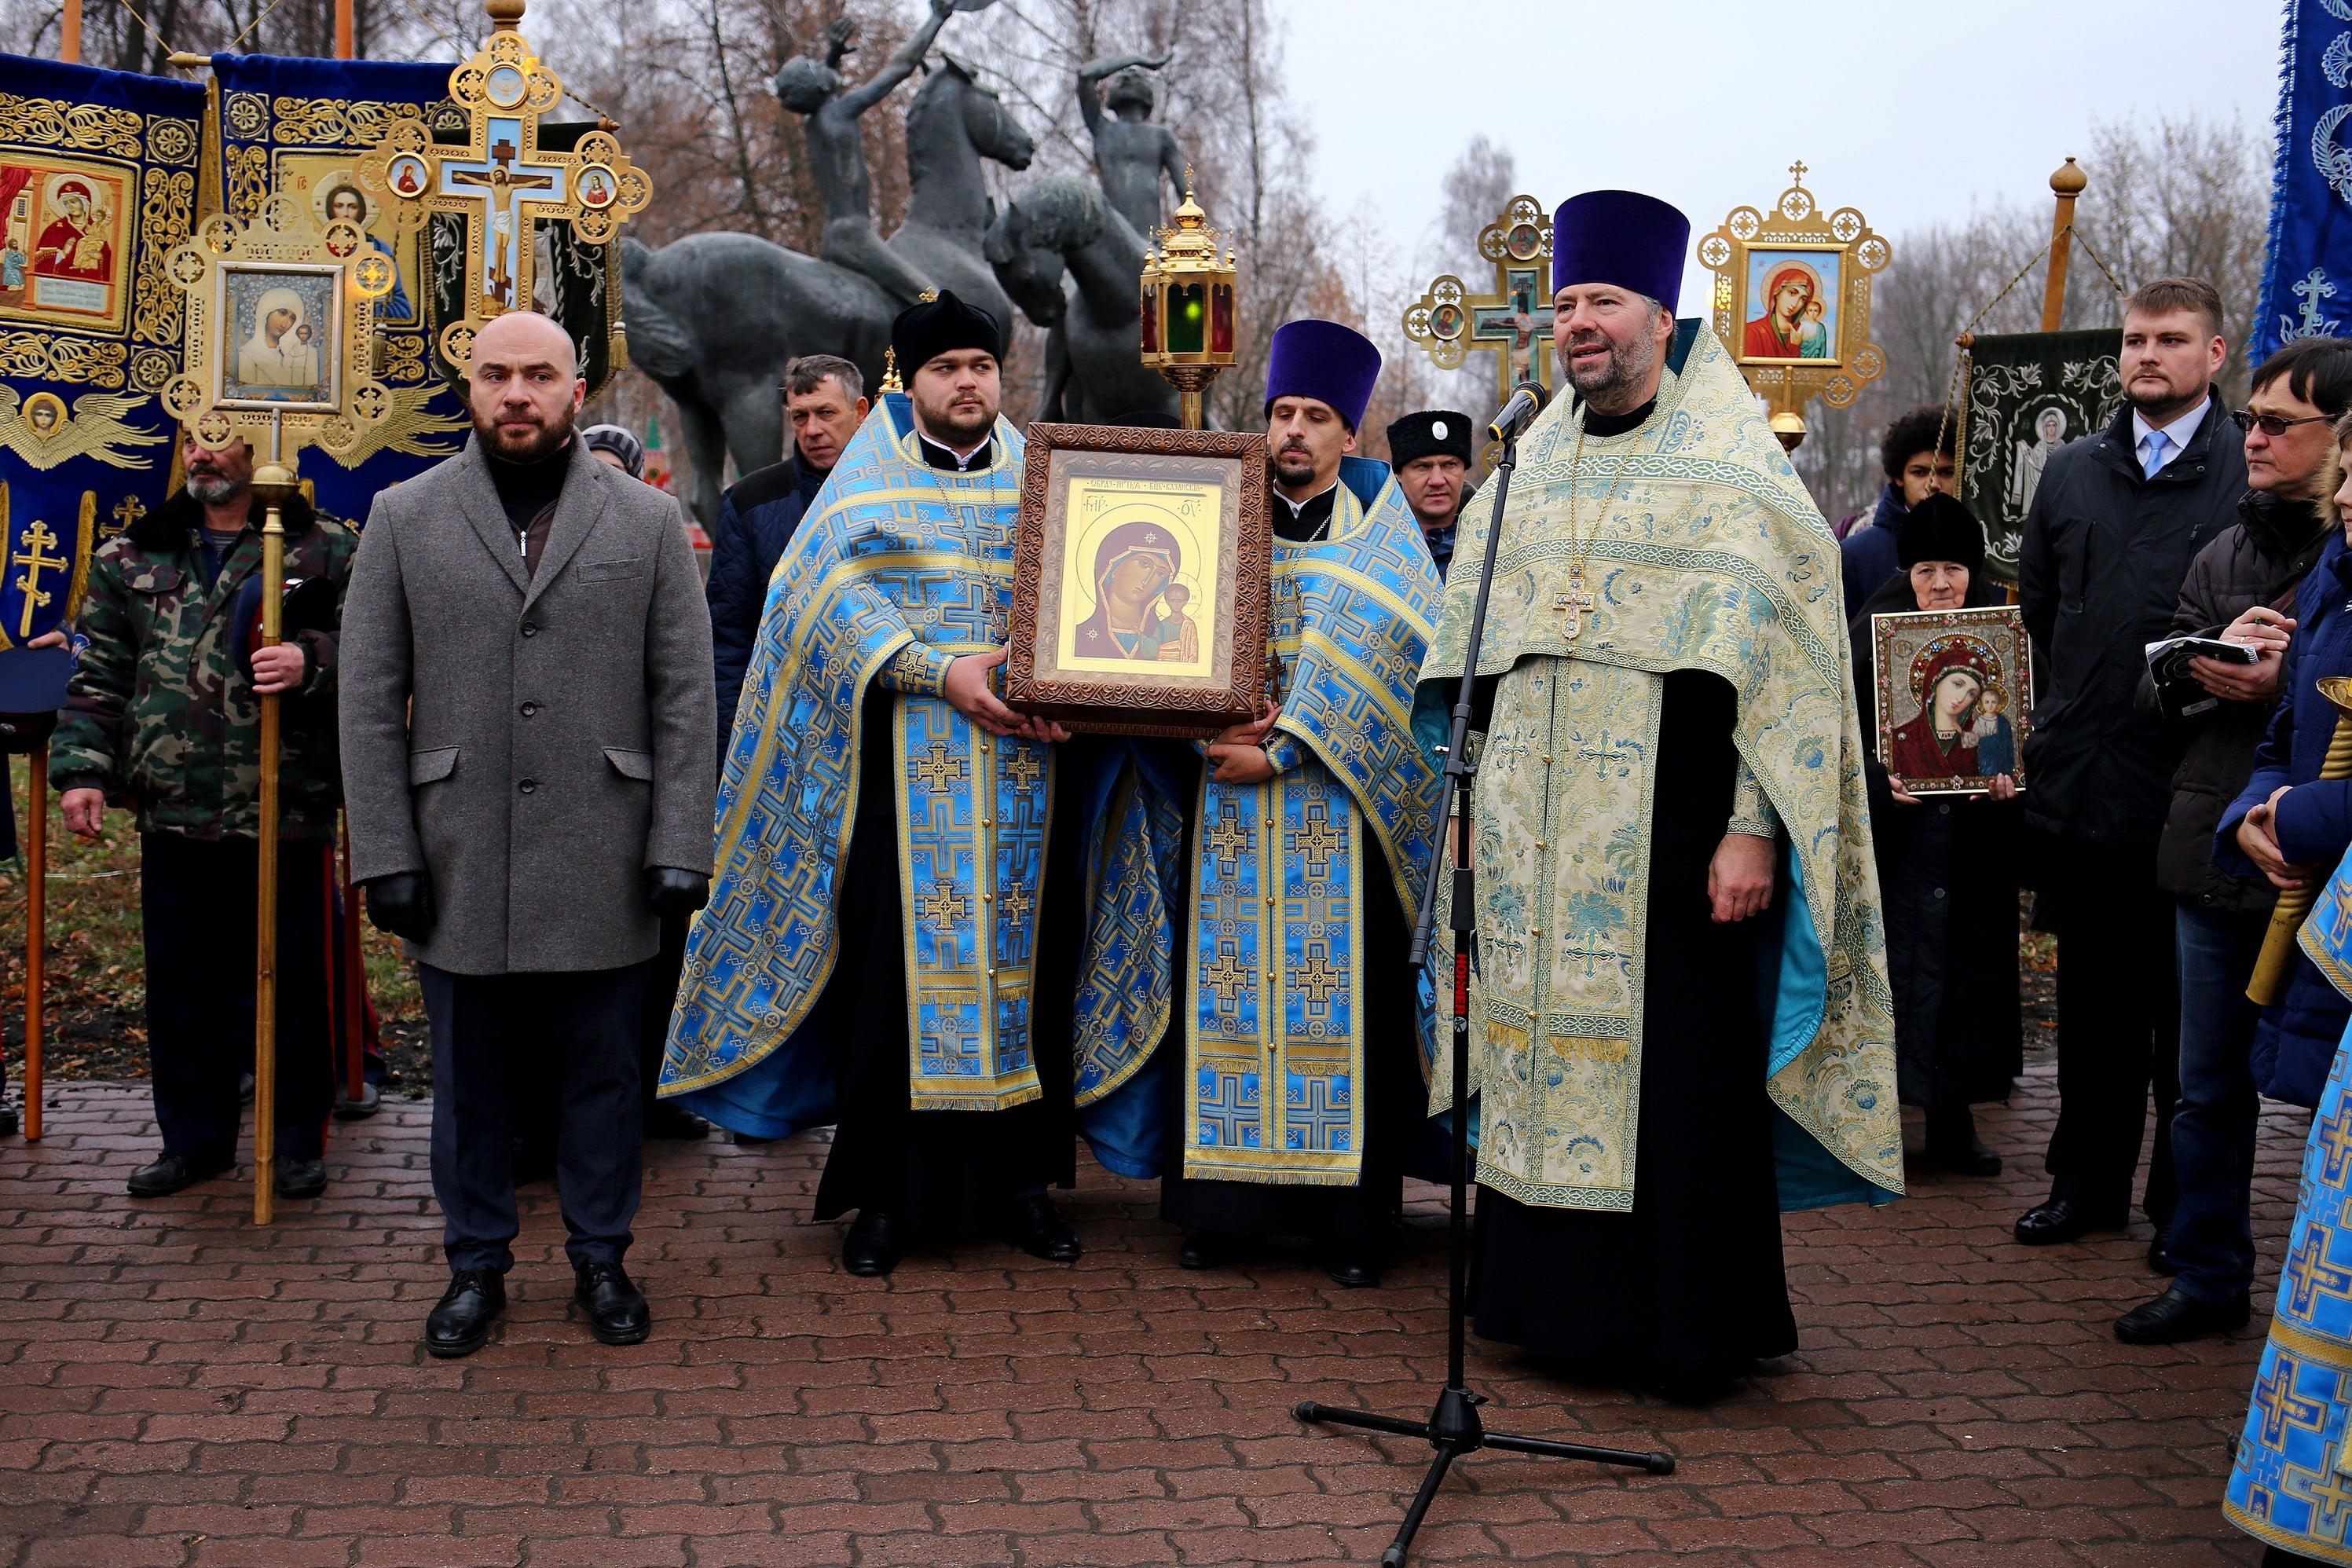 http://monuspen.ru/photoreports/e885ad143ffeae12541ceee7e7725b2v.jpg